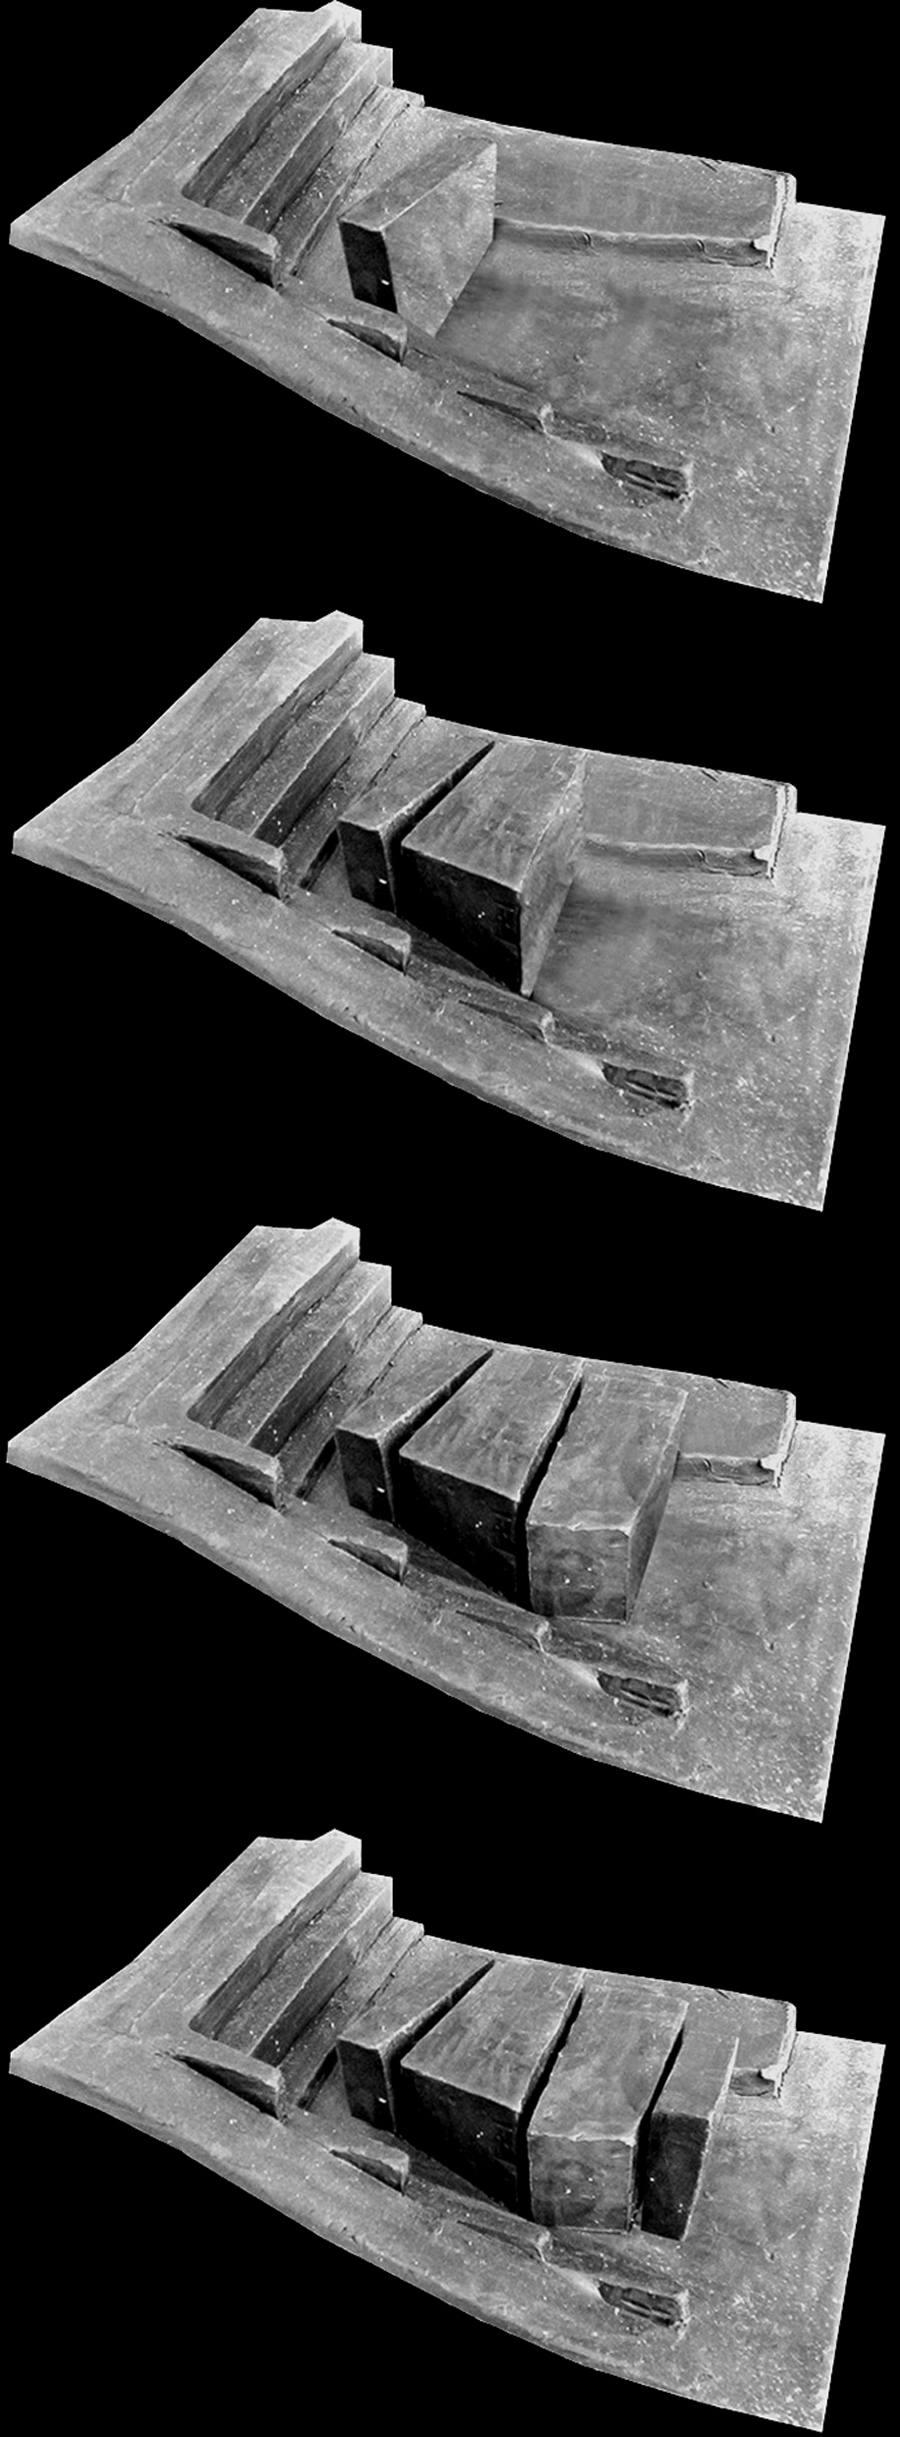 Revista de arquitectura y dise o peruarki menis for Revista arquitectura y diseno